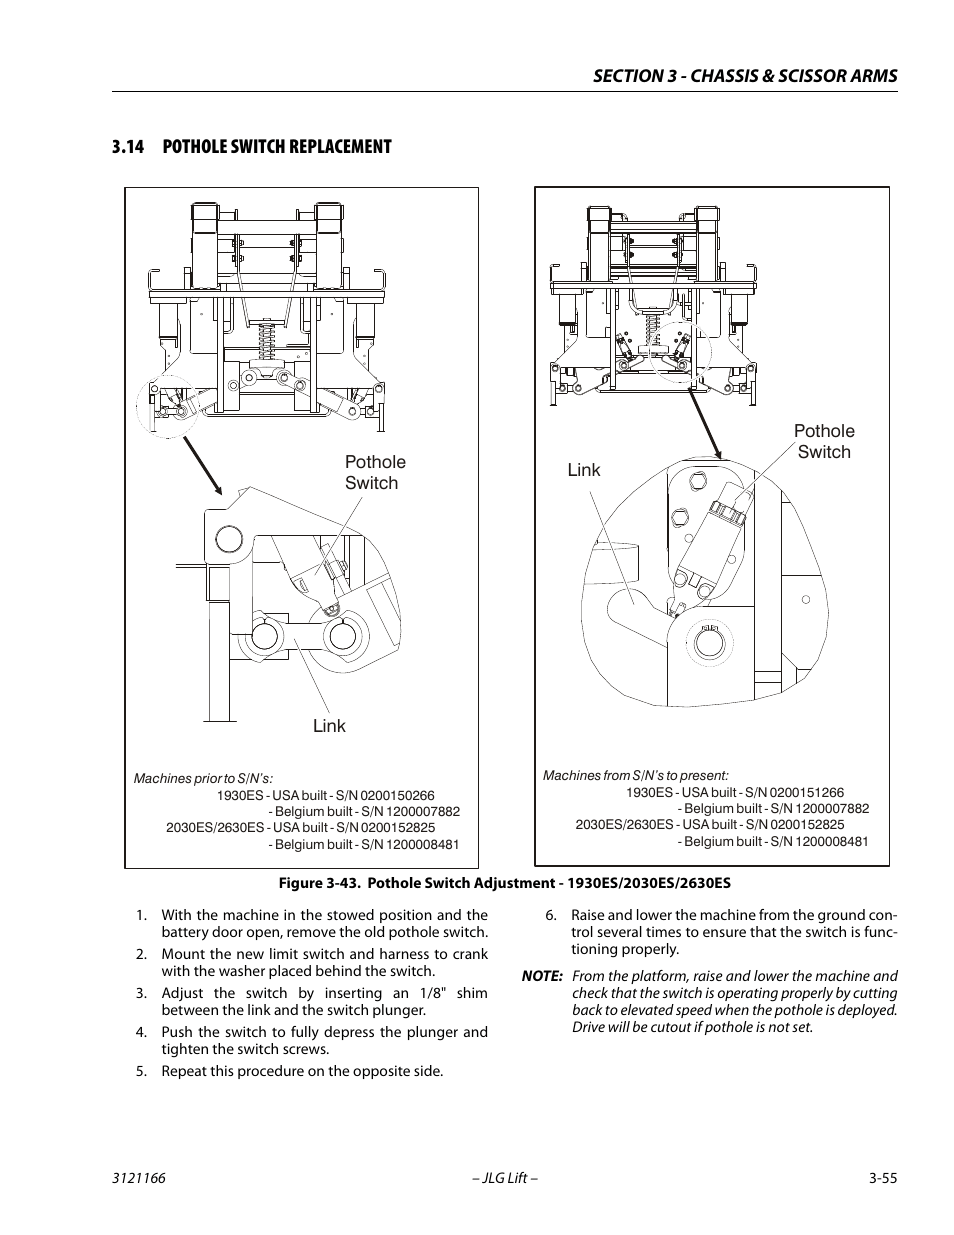 Jlg 40h Wiring Diagram 22 Images Diagrams 3246 Joystick 3246es Service Manual Page91resize6652c861 2030